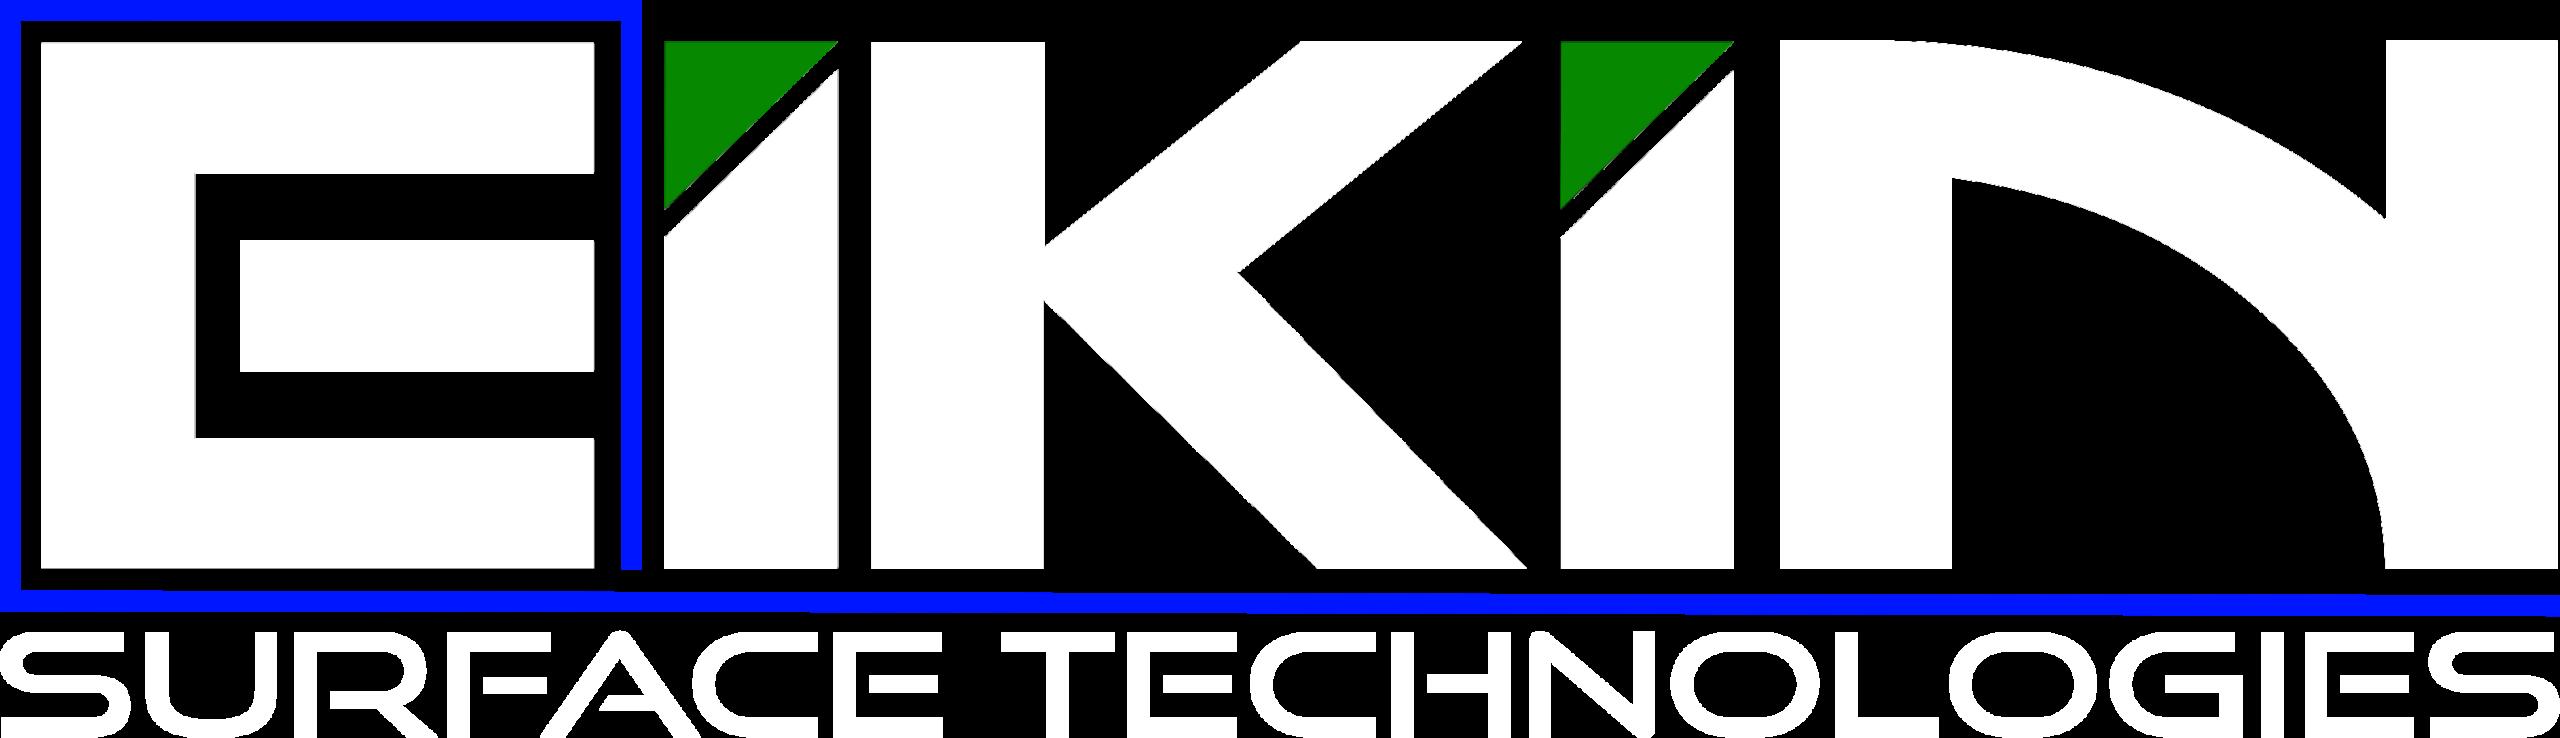 Eikin_Logo_Schrift_weiss